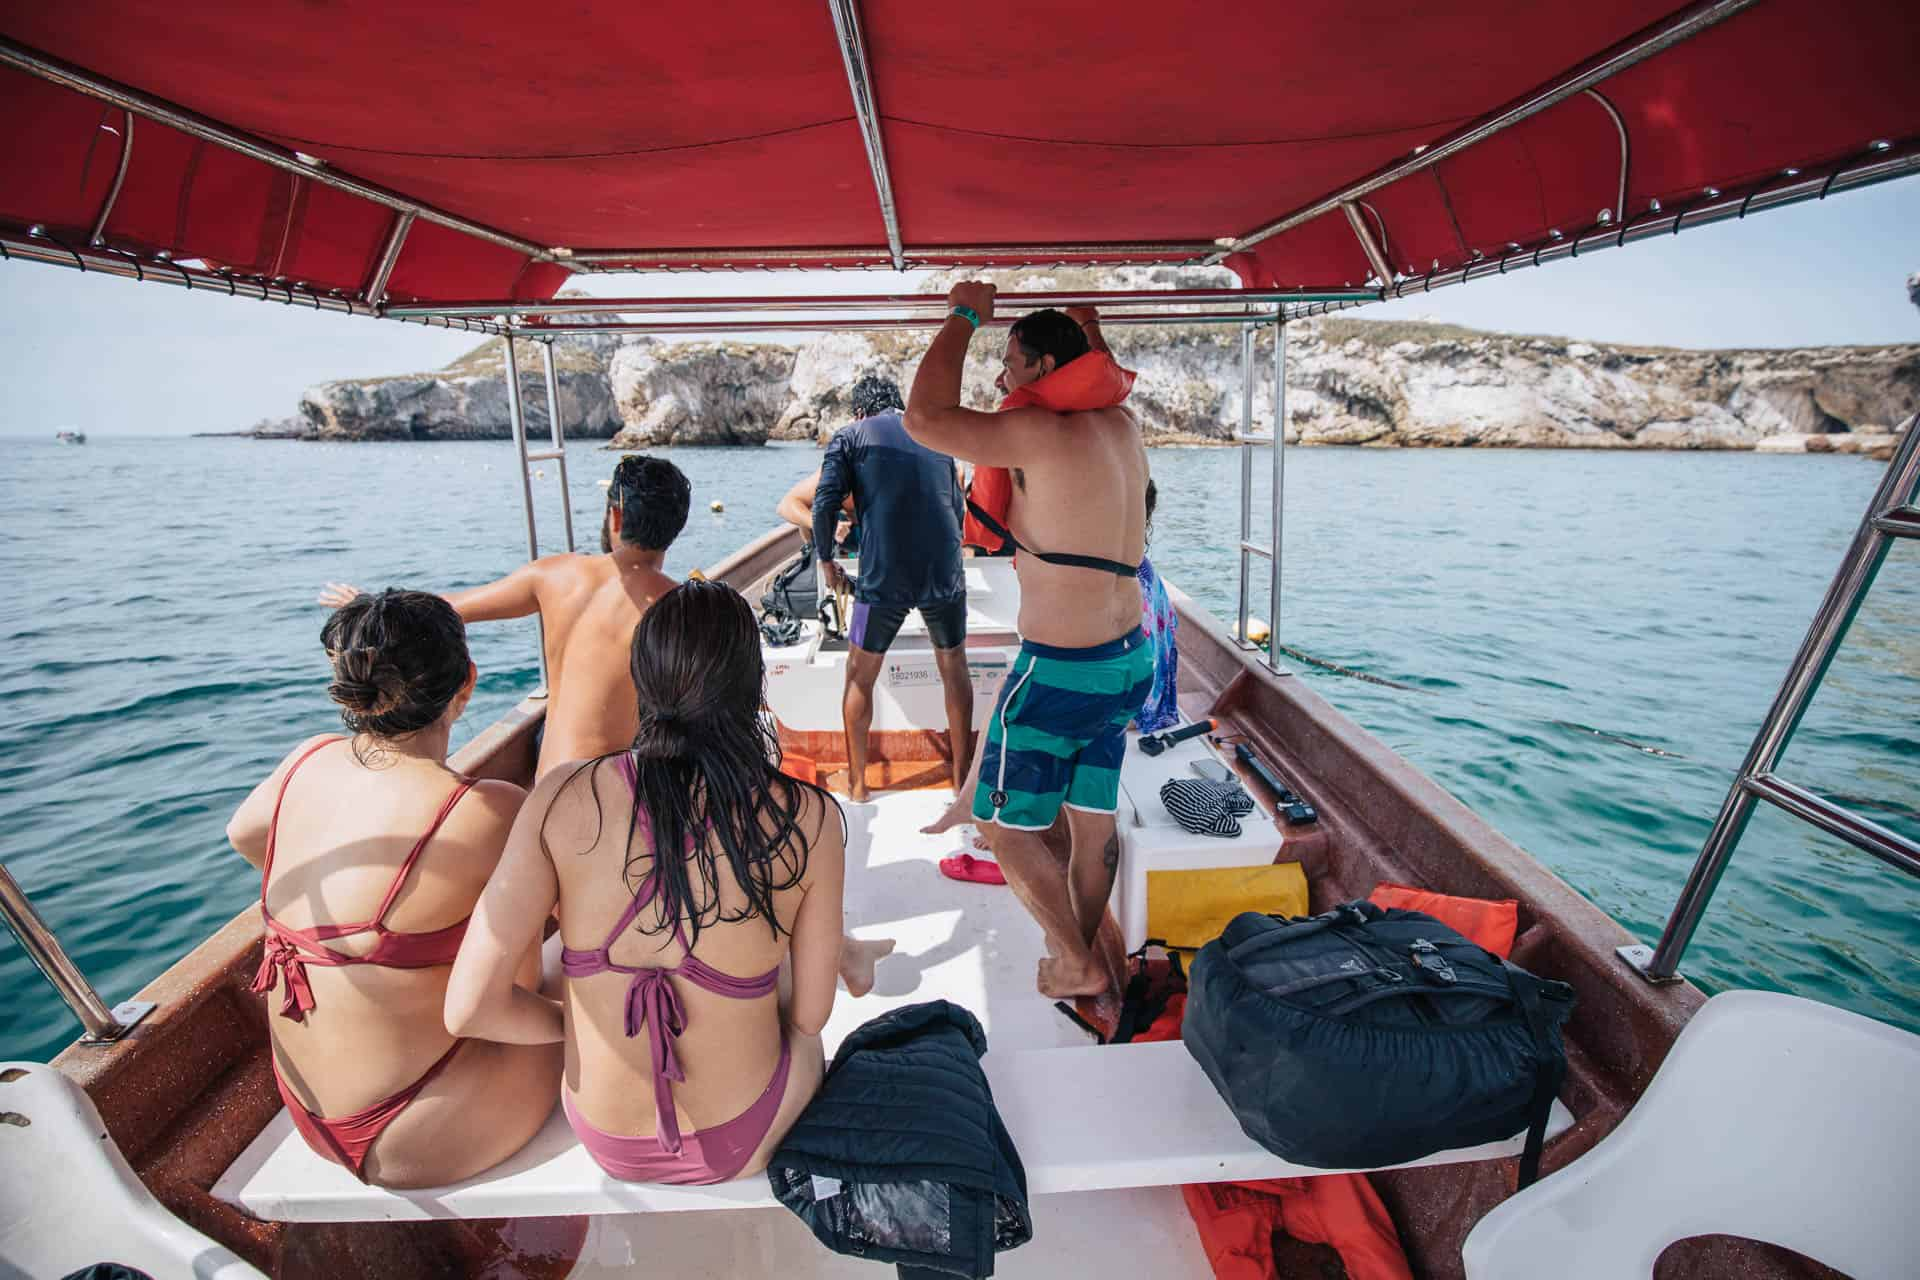 marietas islands, secret beach mexico, things to do in sayulita, sayulita mexico, what to do in sayulita, sayulita, monkey mountain sayulita